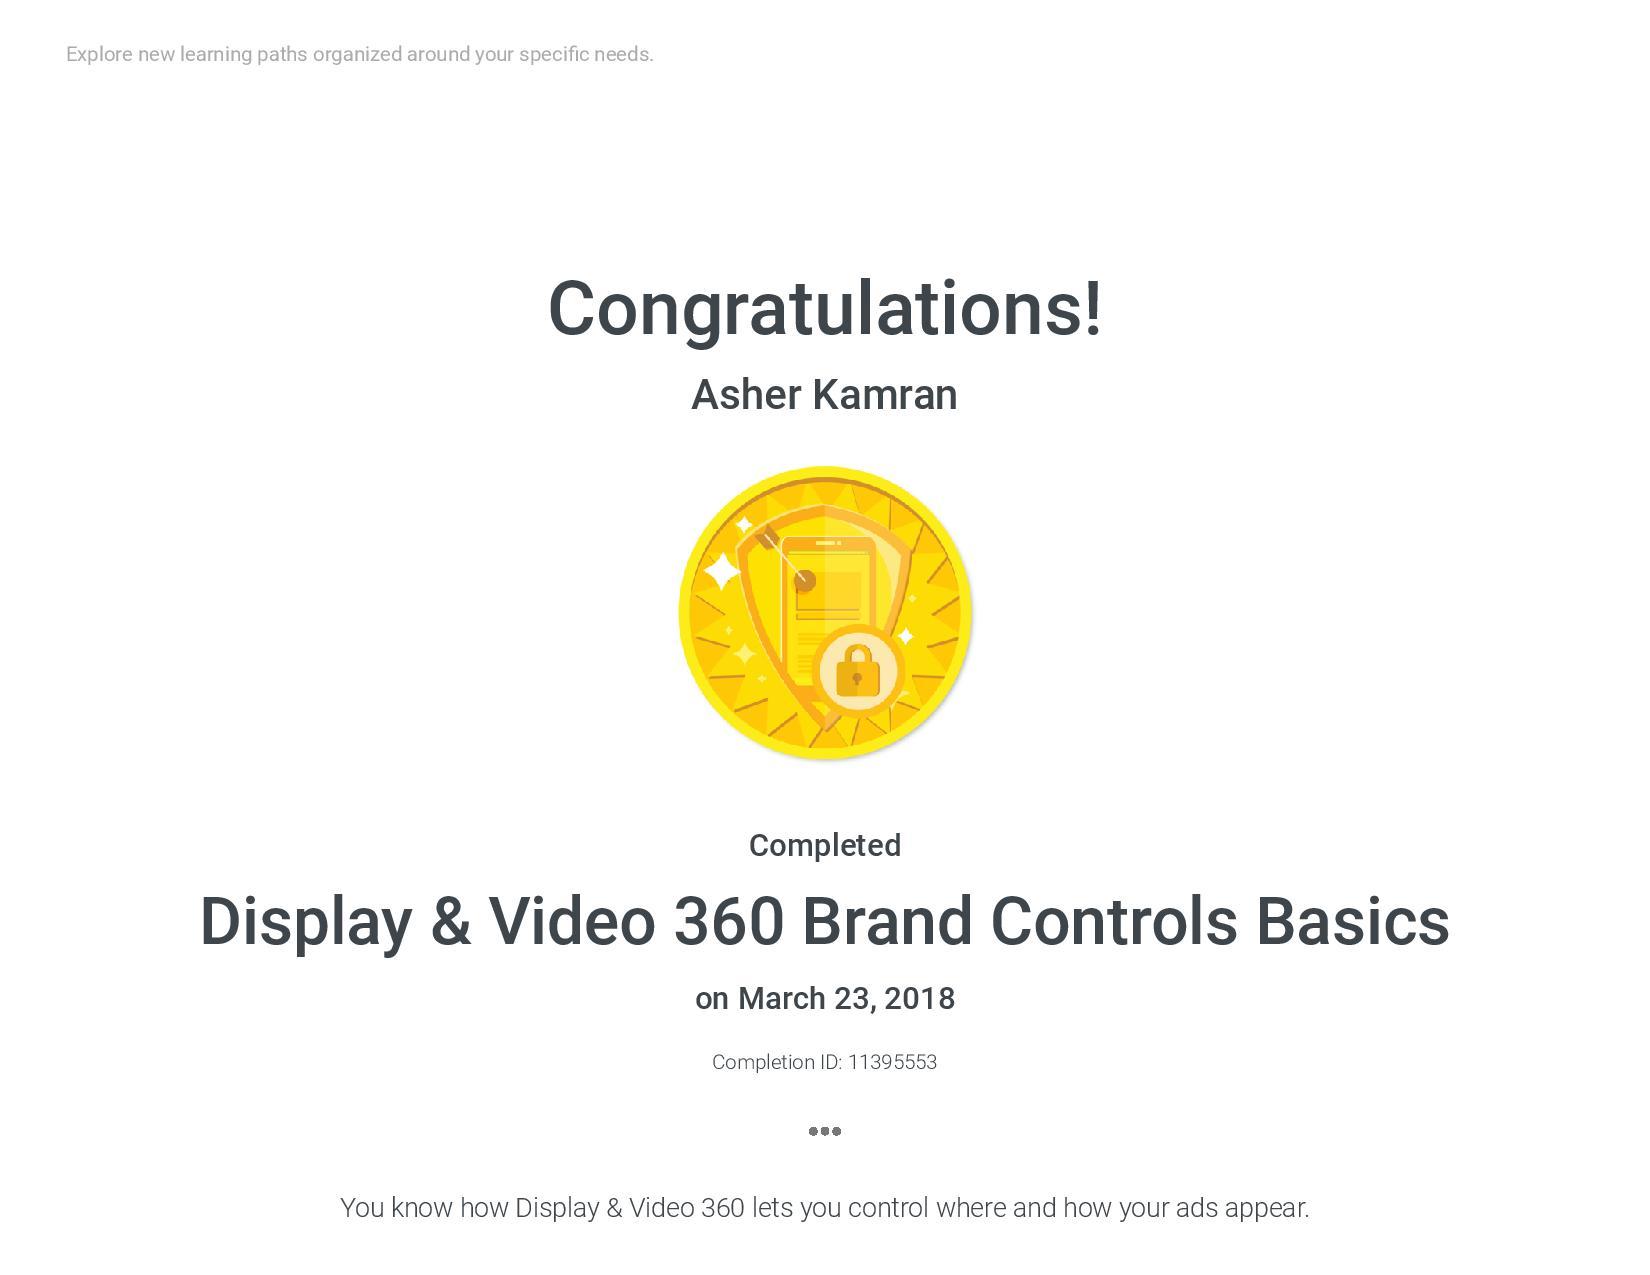 Display & Video 360 Brand Controls Basic